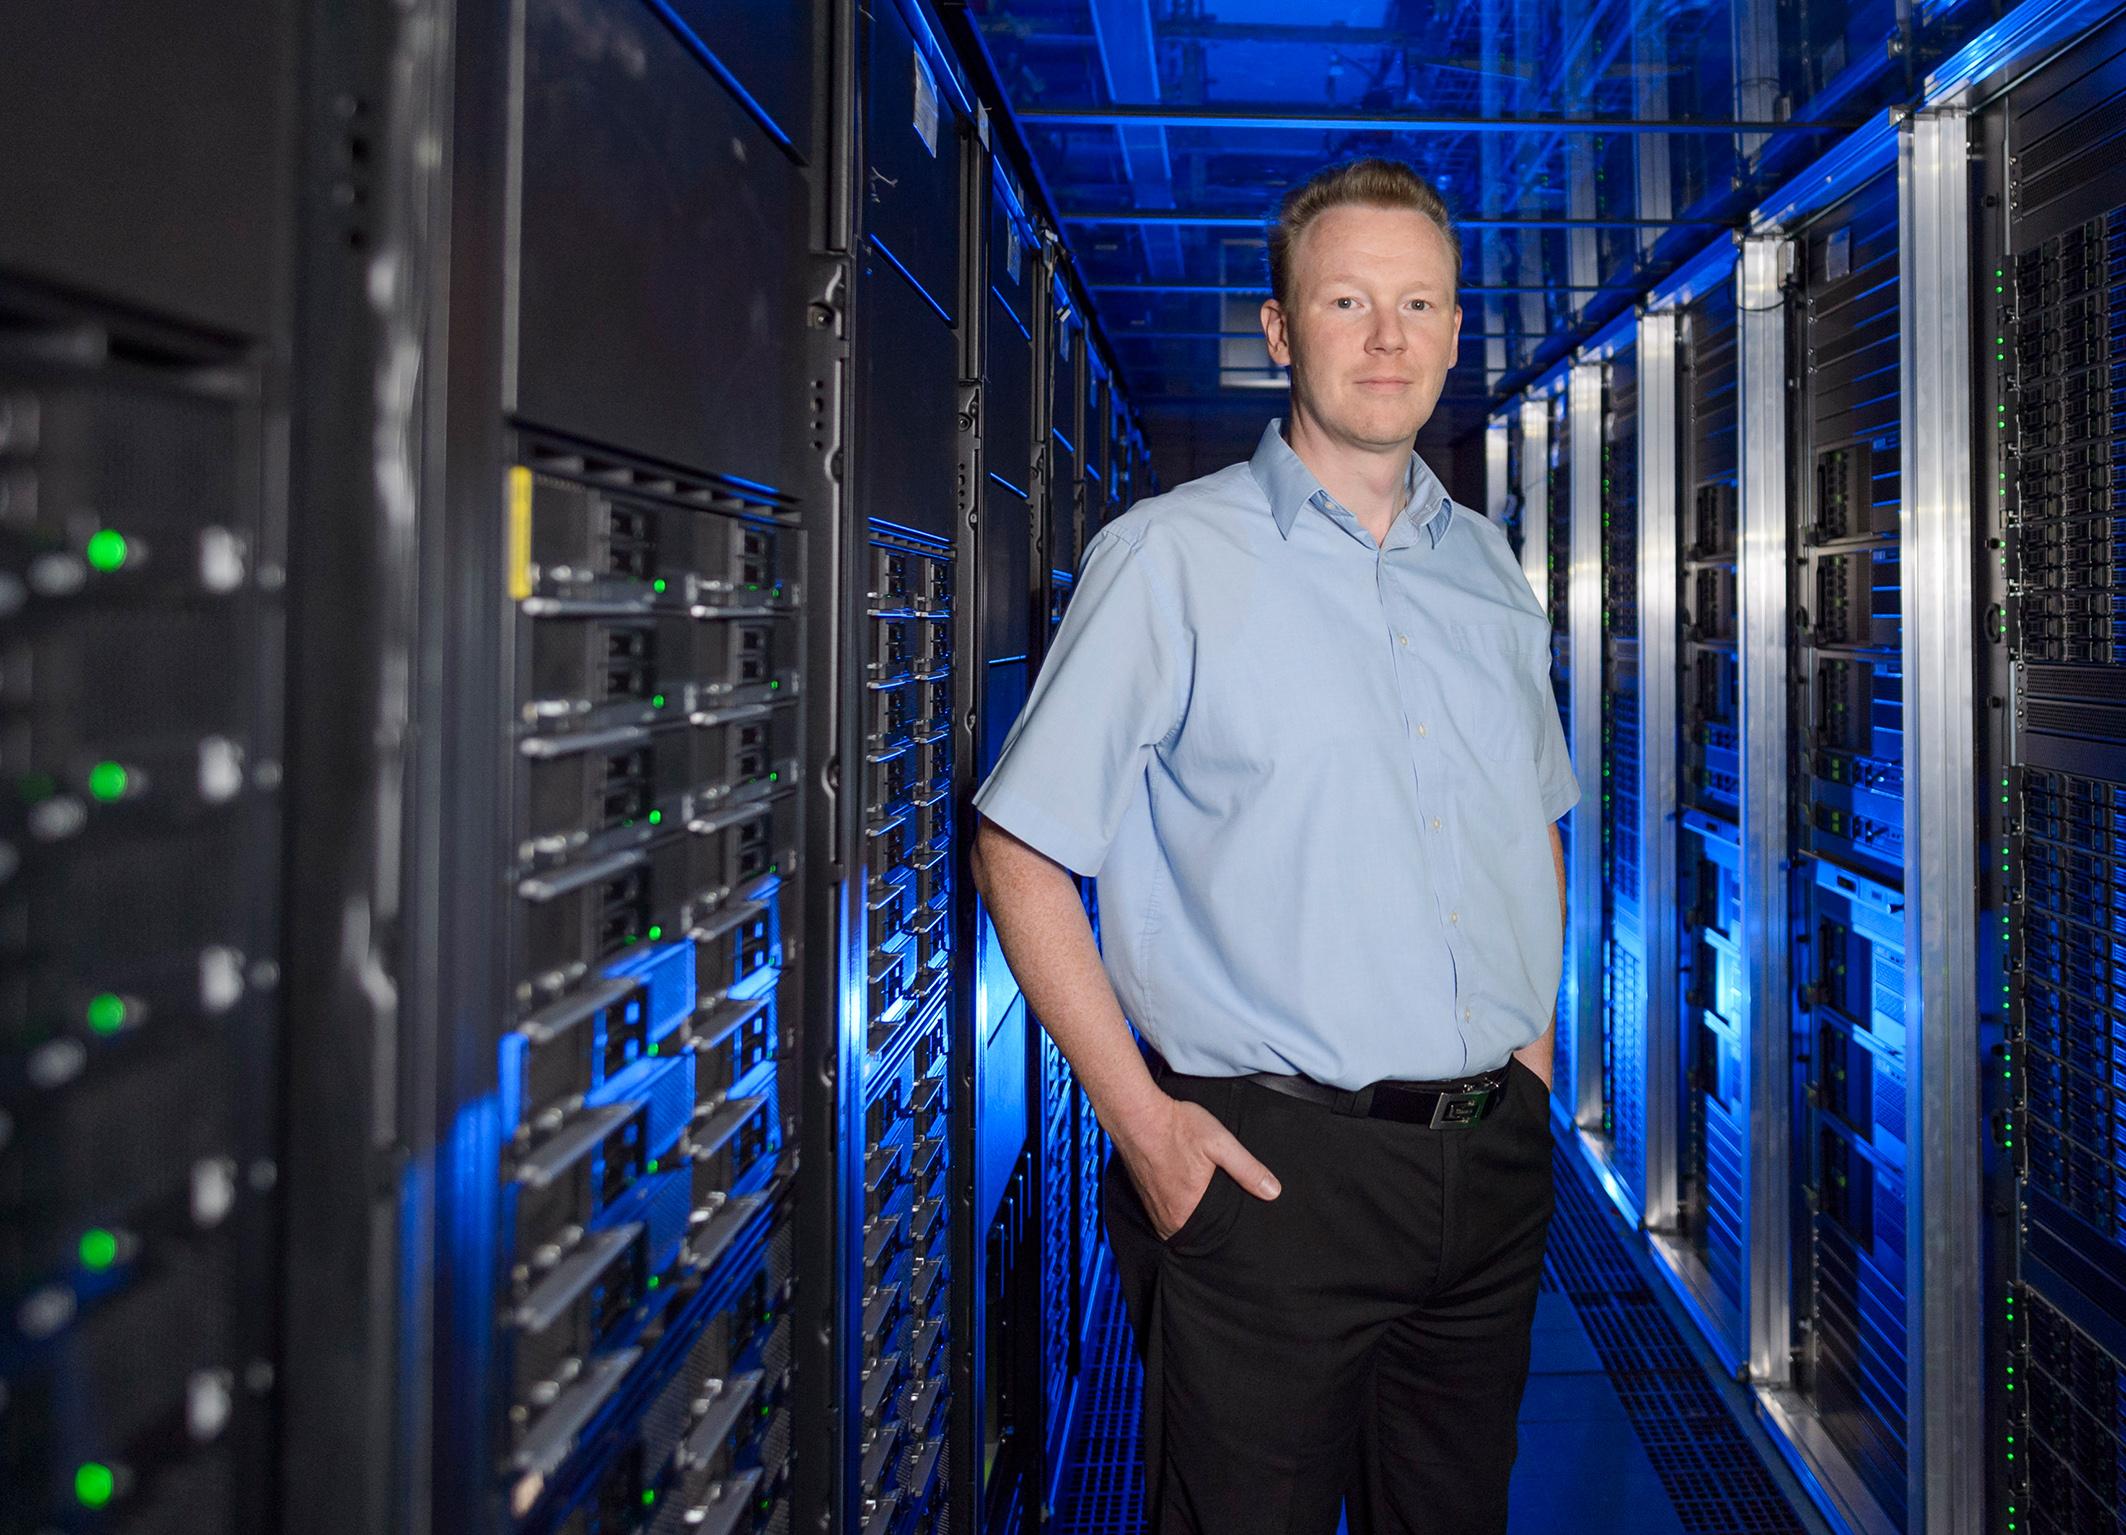 Bosch scientist Dr. Lothar Baum